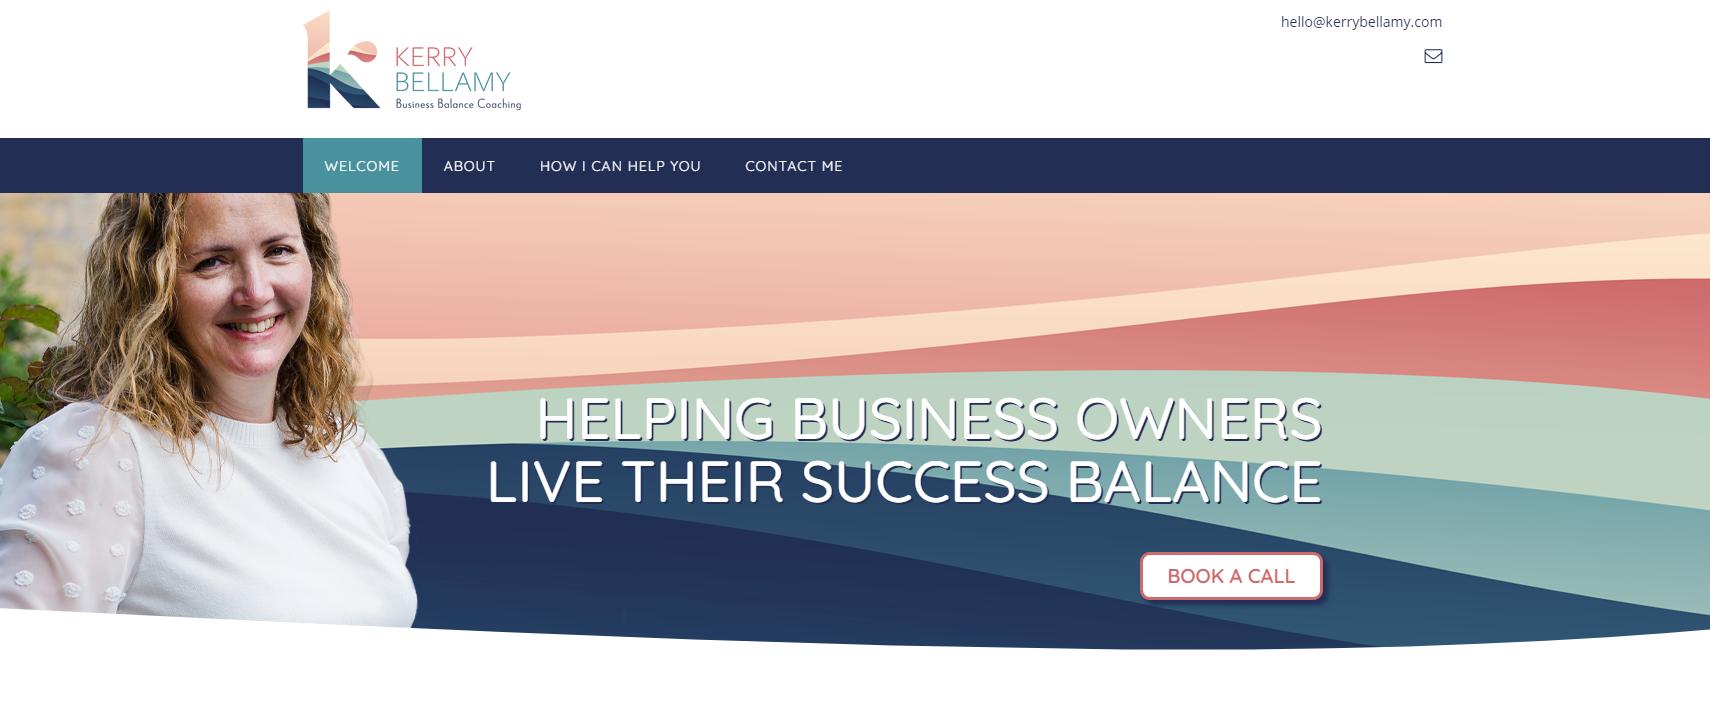 Kerry Bellamy rebrand Website banner